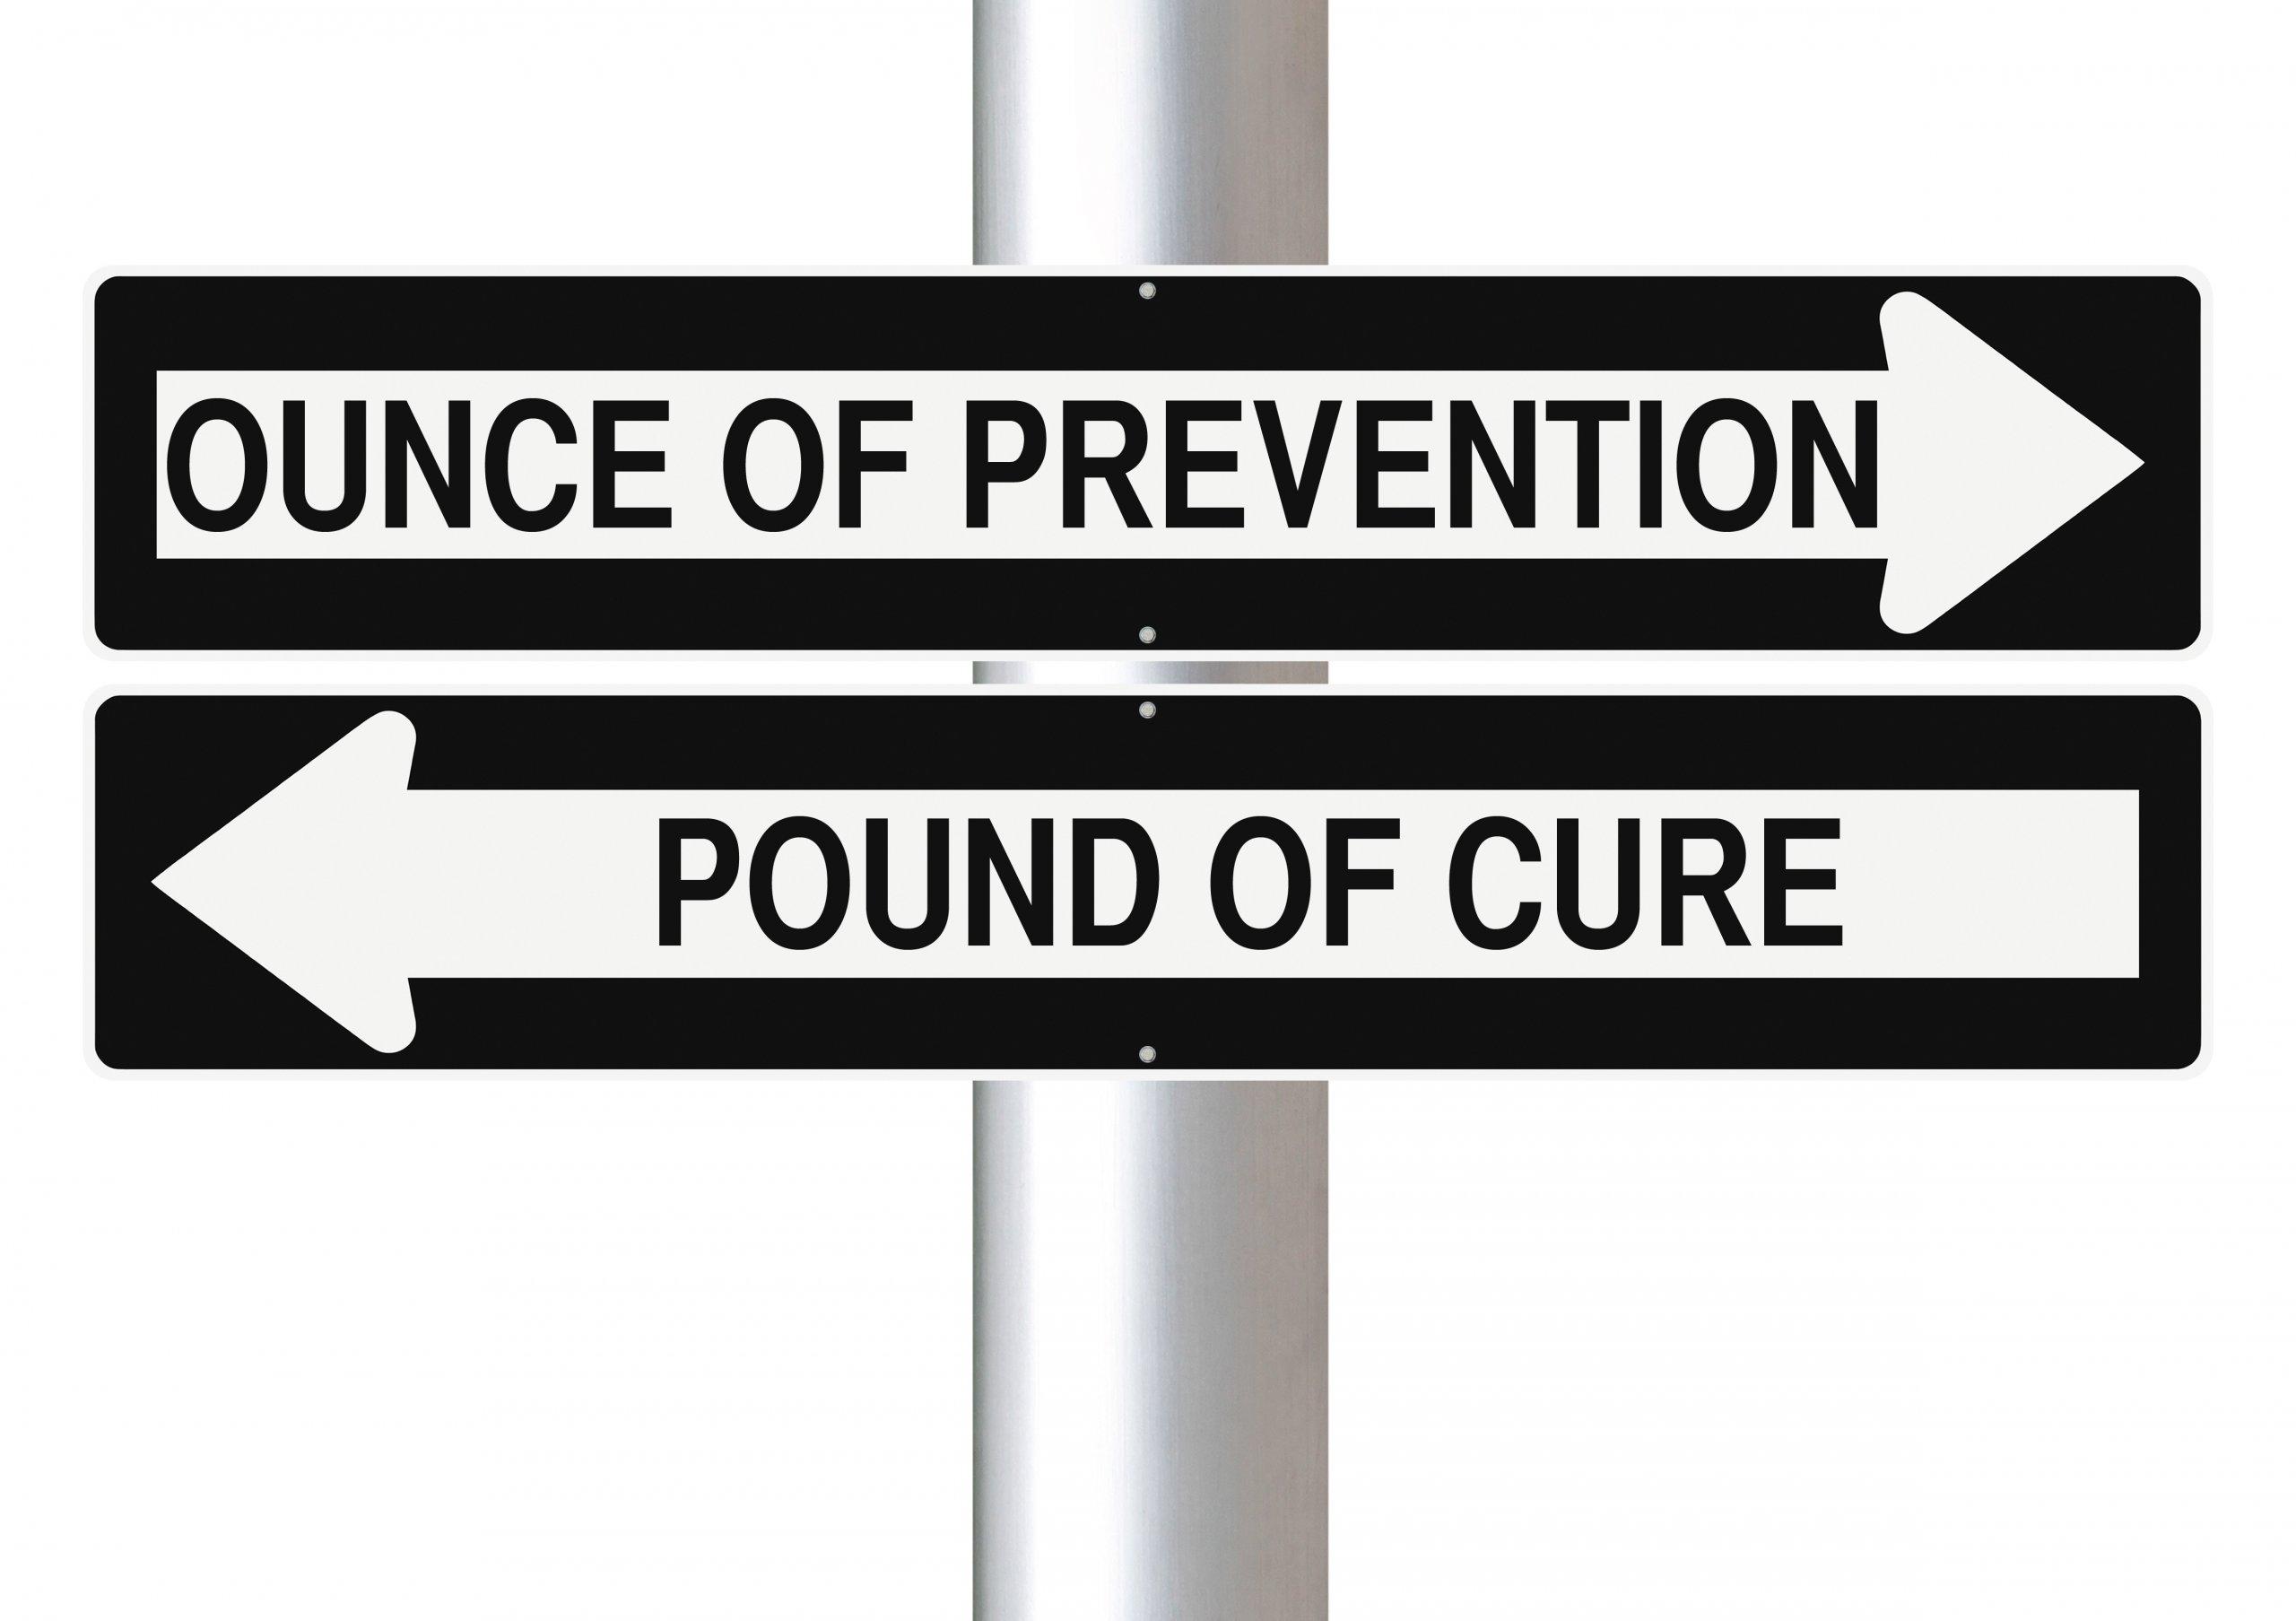 I Believe in Public Health